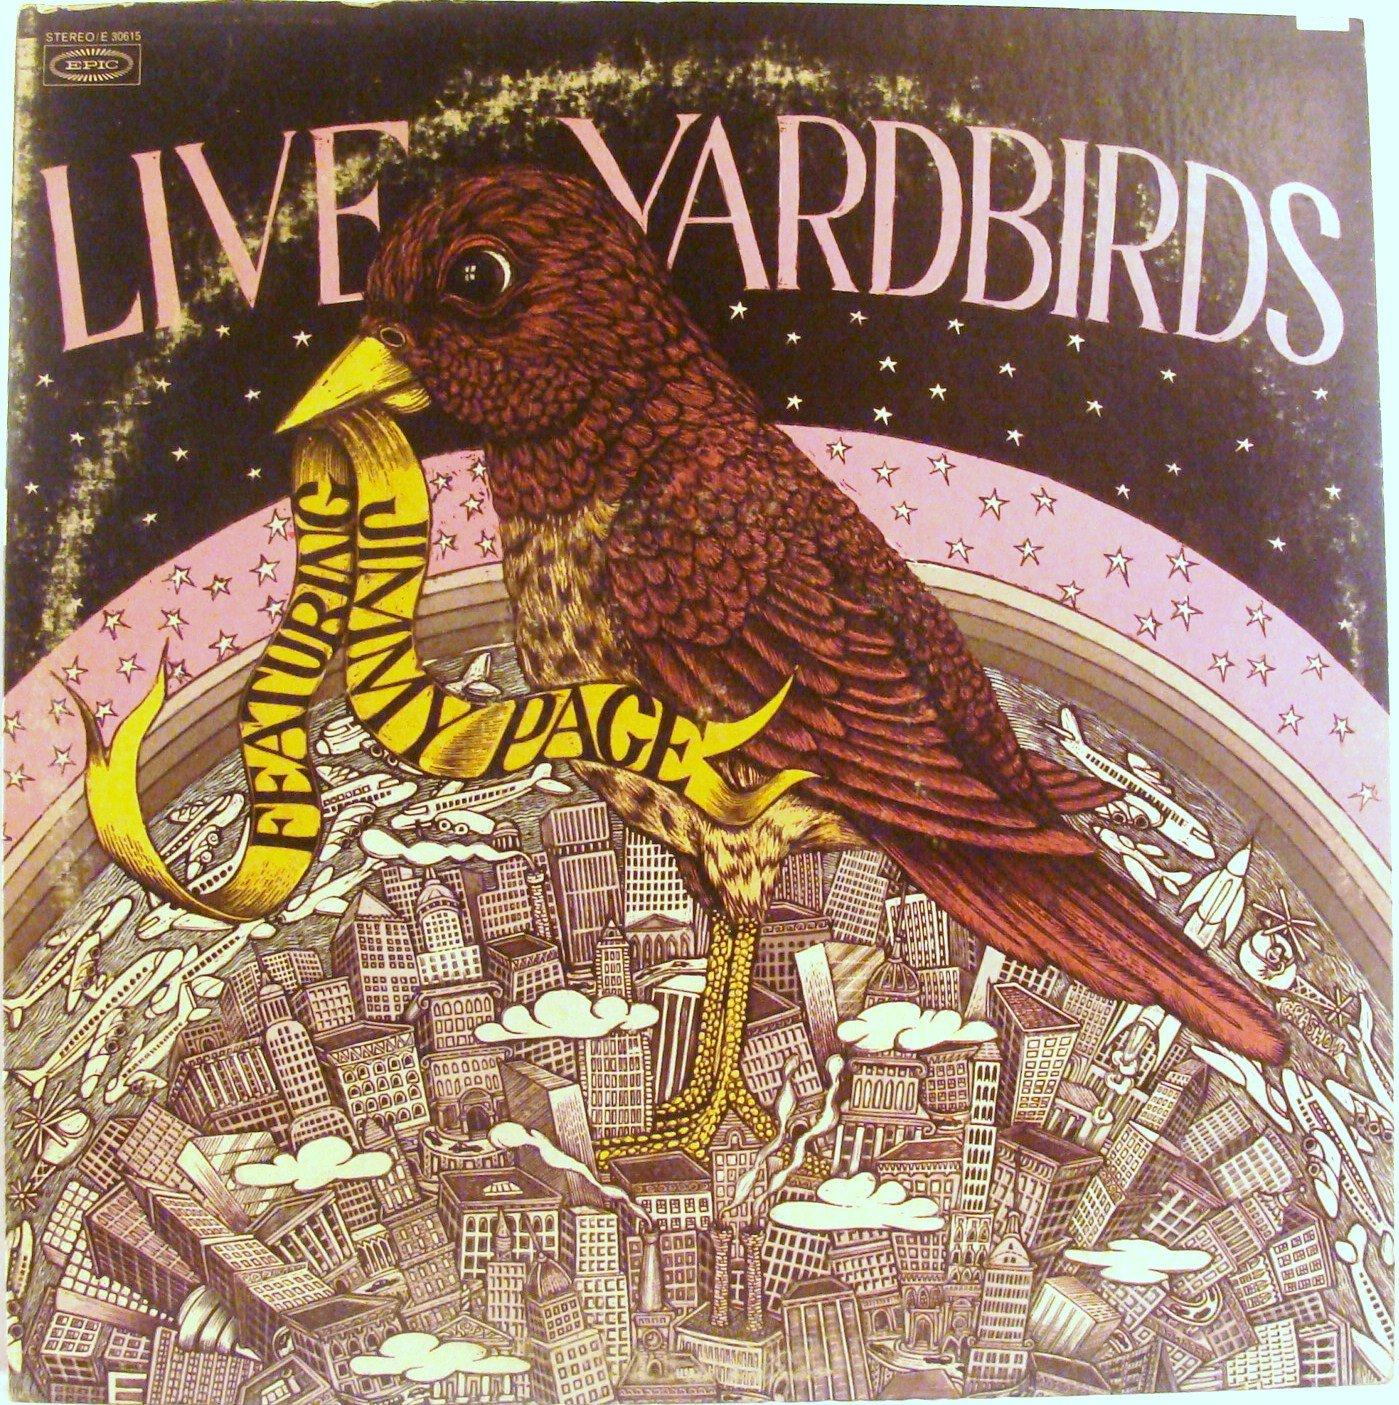 The Yardbirds - Live Yardbirds Featuring Jimmy Page - Amazon.com Music